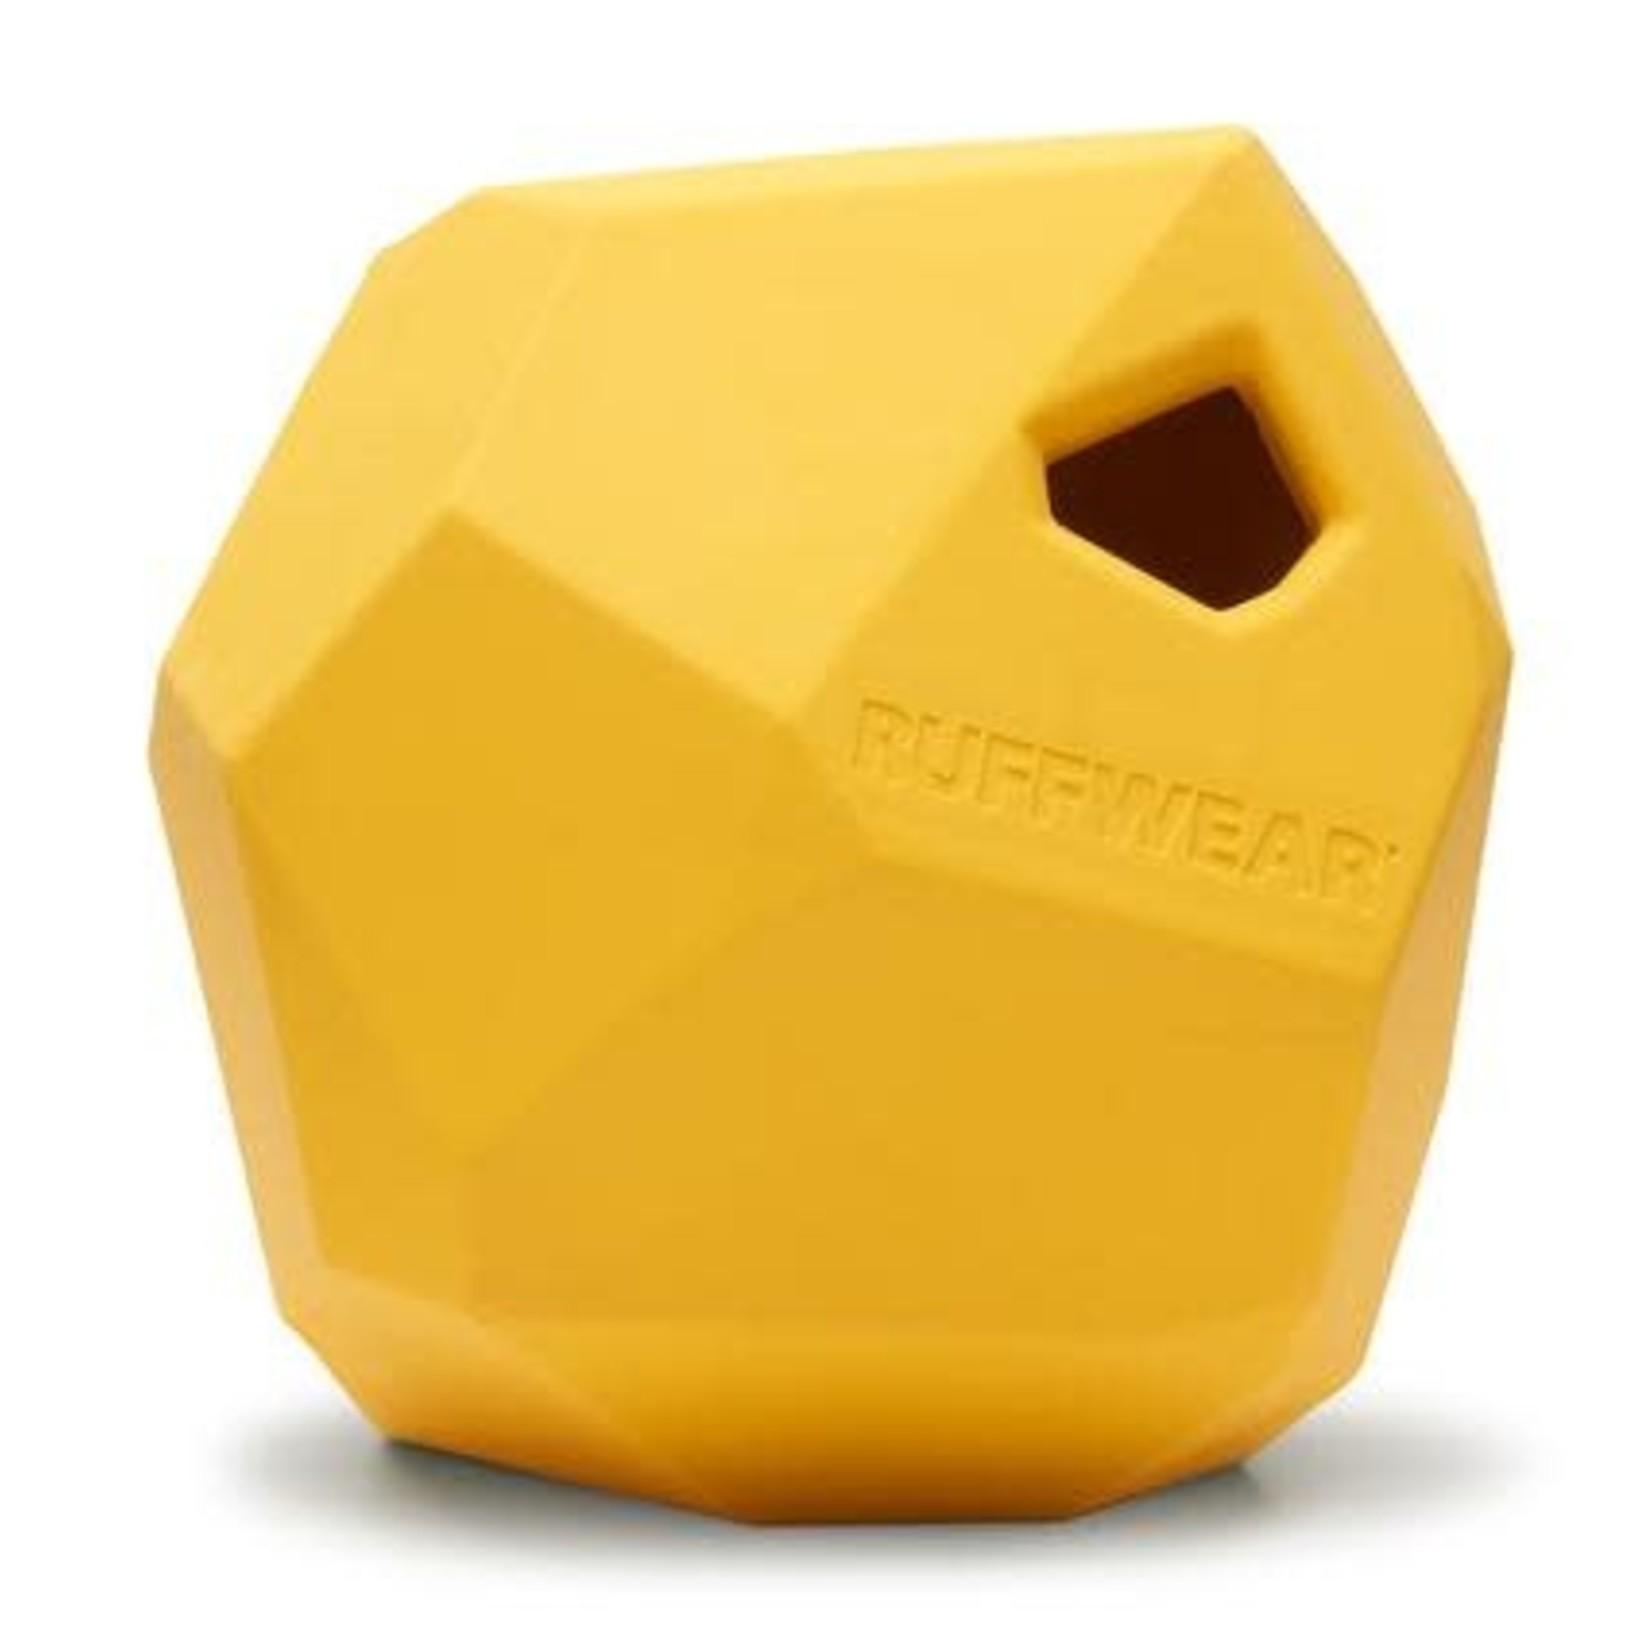 Ruff Wear Ruffwear Gnawt-a-Rock Dandelion Yellow